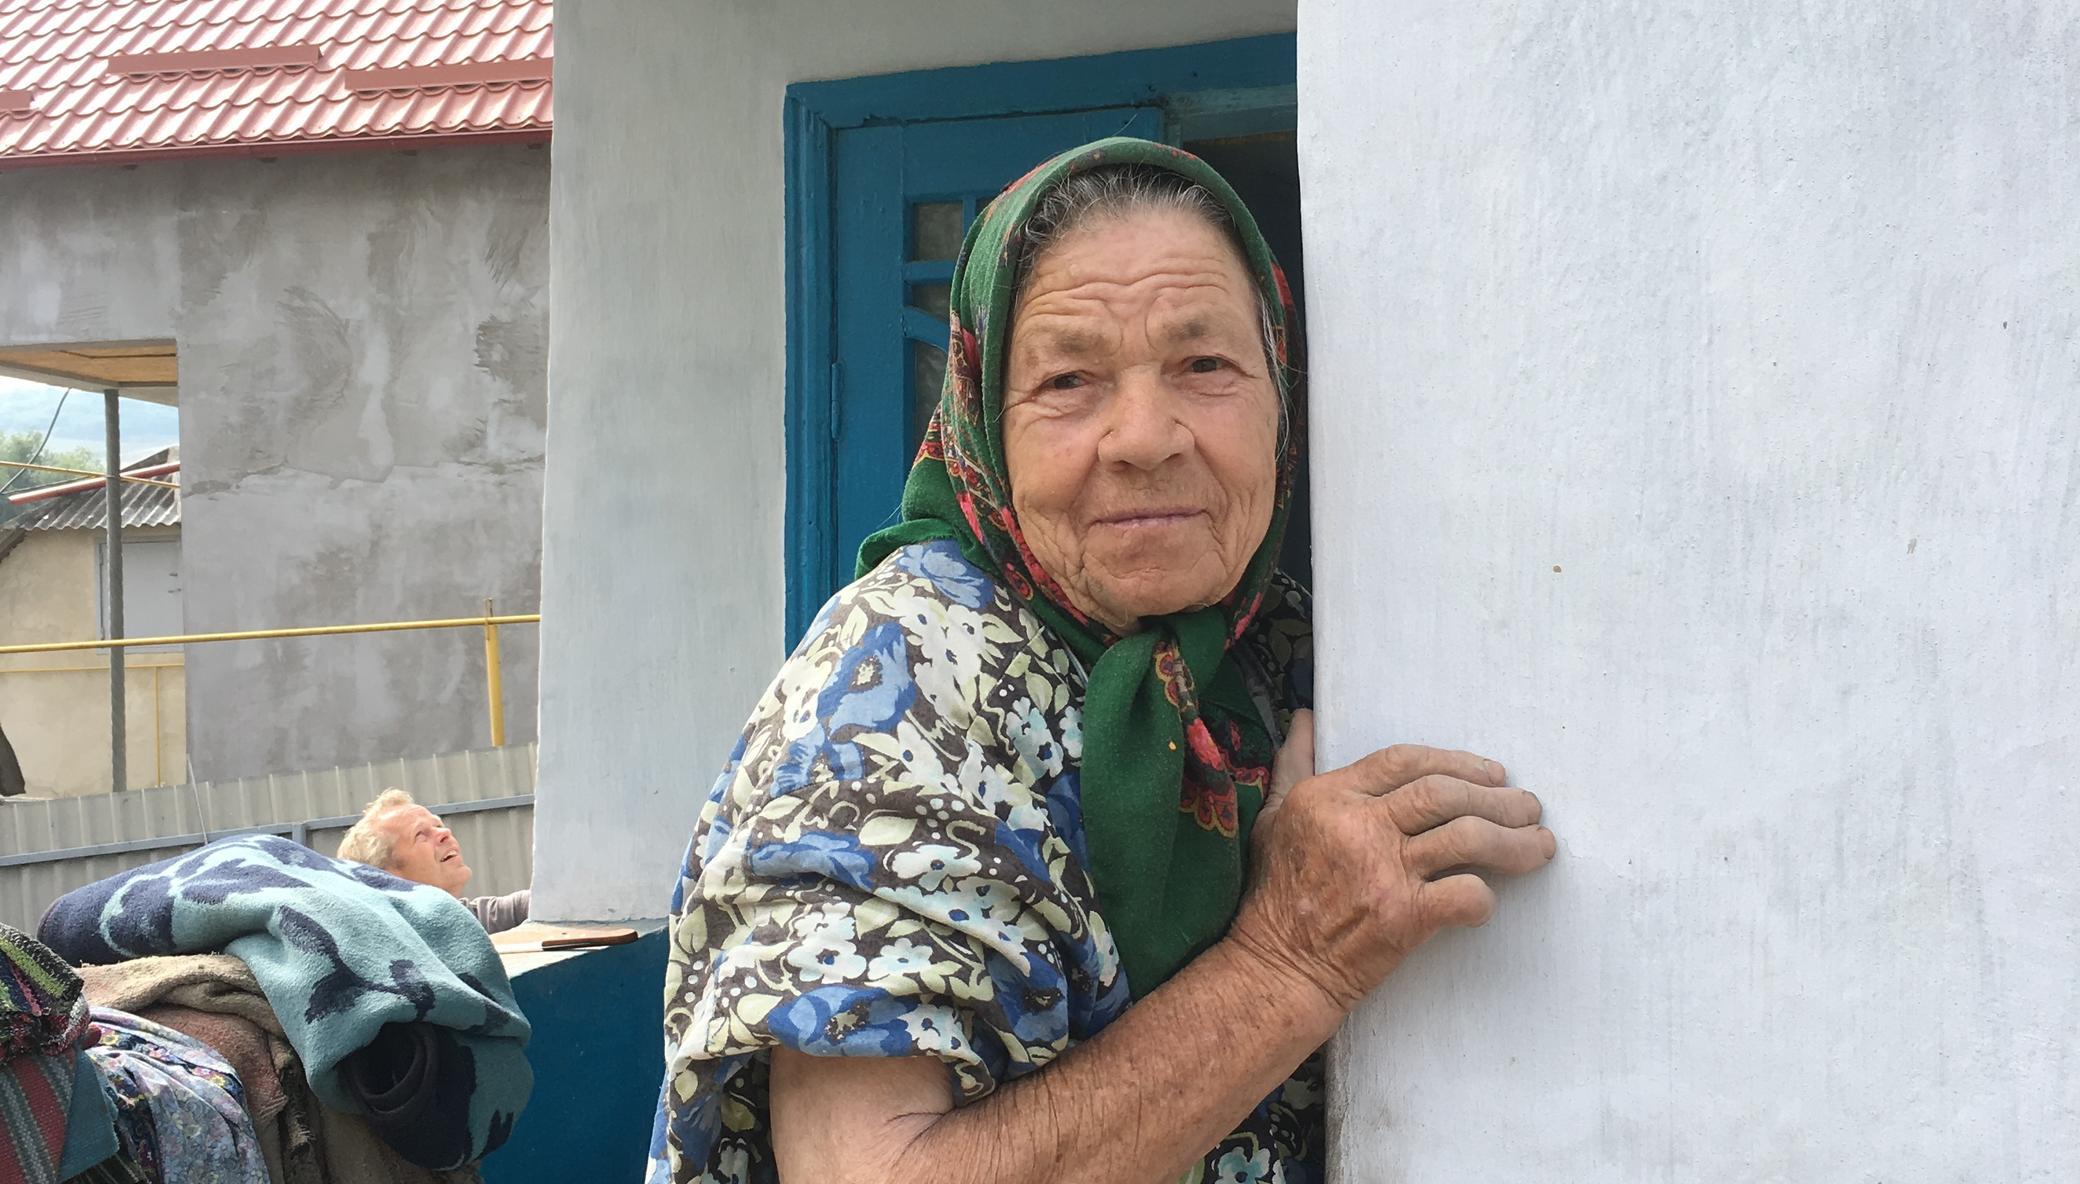 Help 250+ Vulnerable Elderly in Moldova